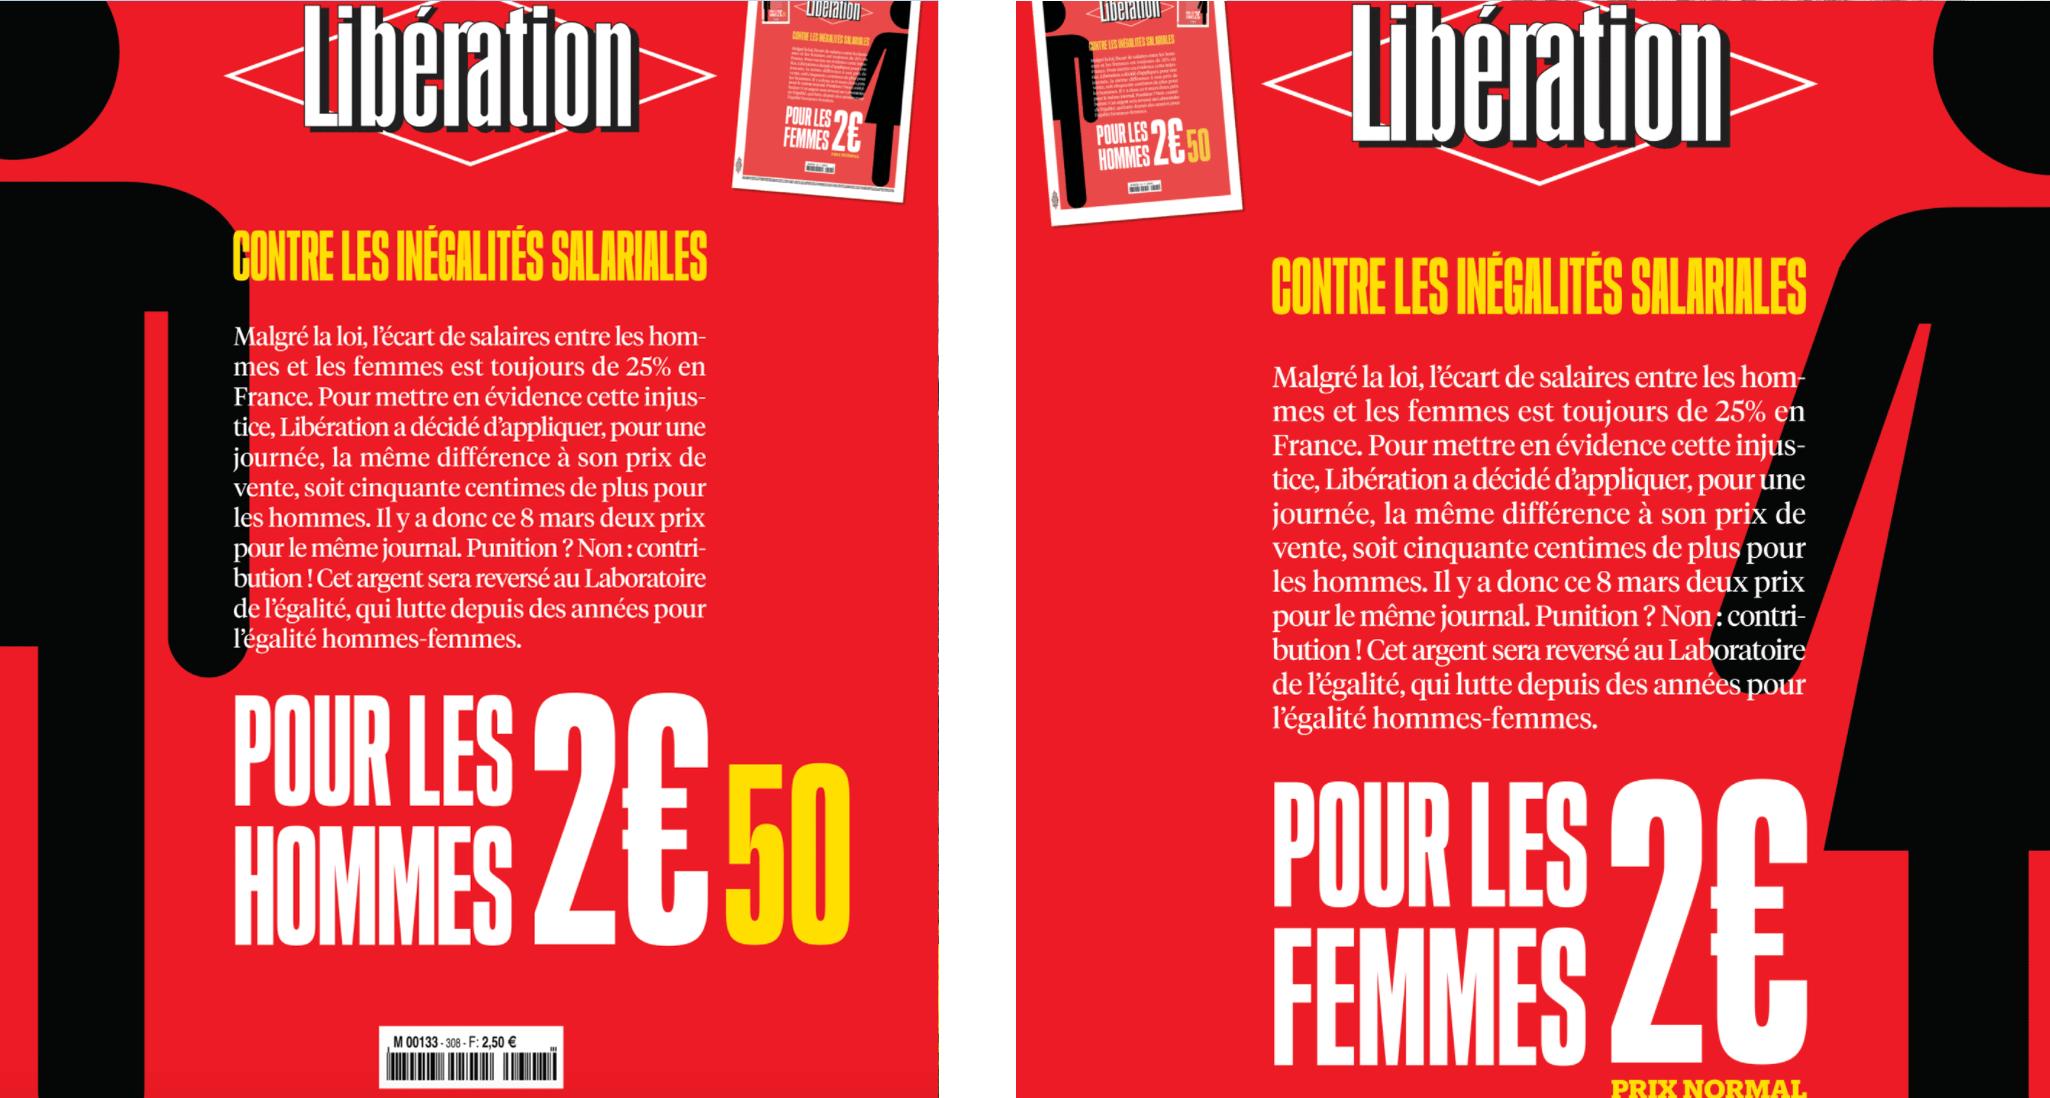 liberation 8 marzo